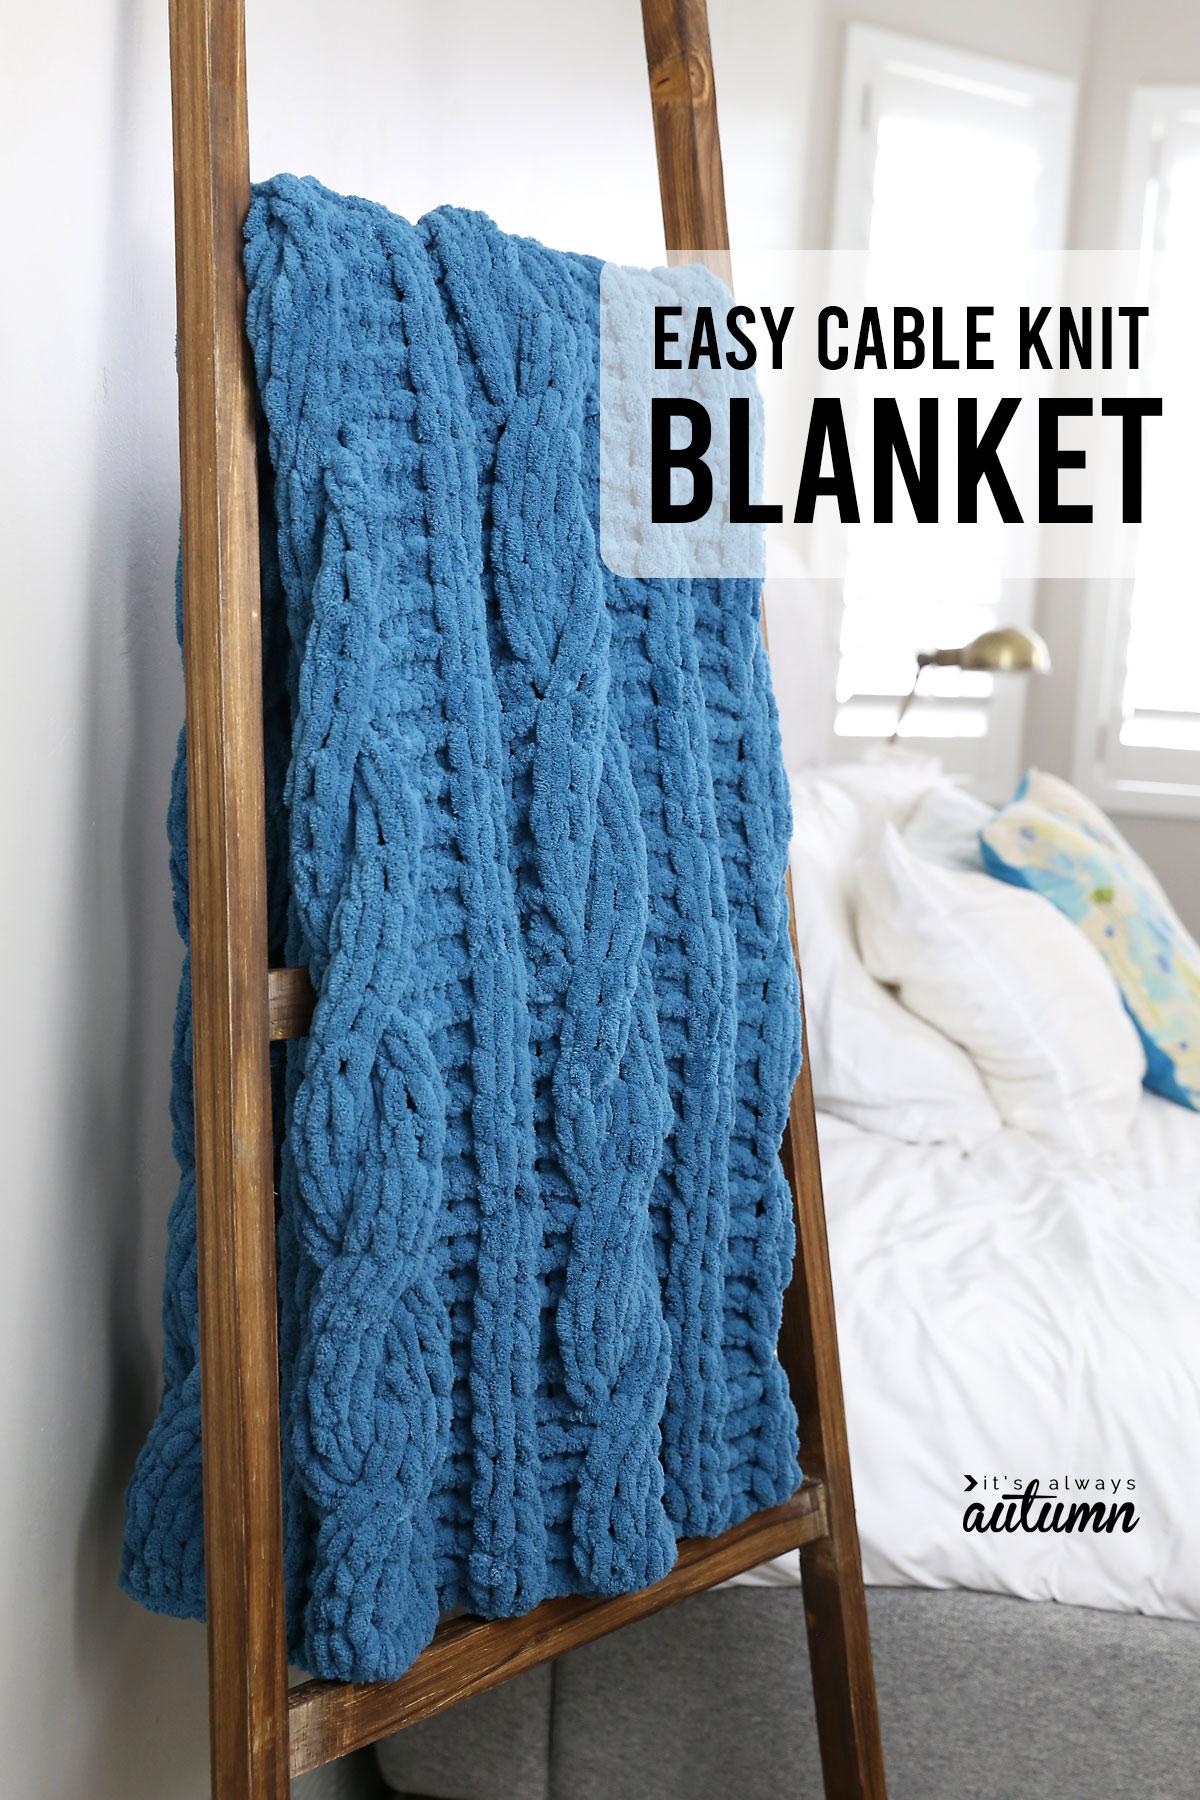 Easy cable knit blanket hanging on a blanket ladder